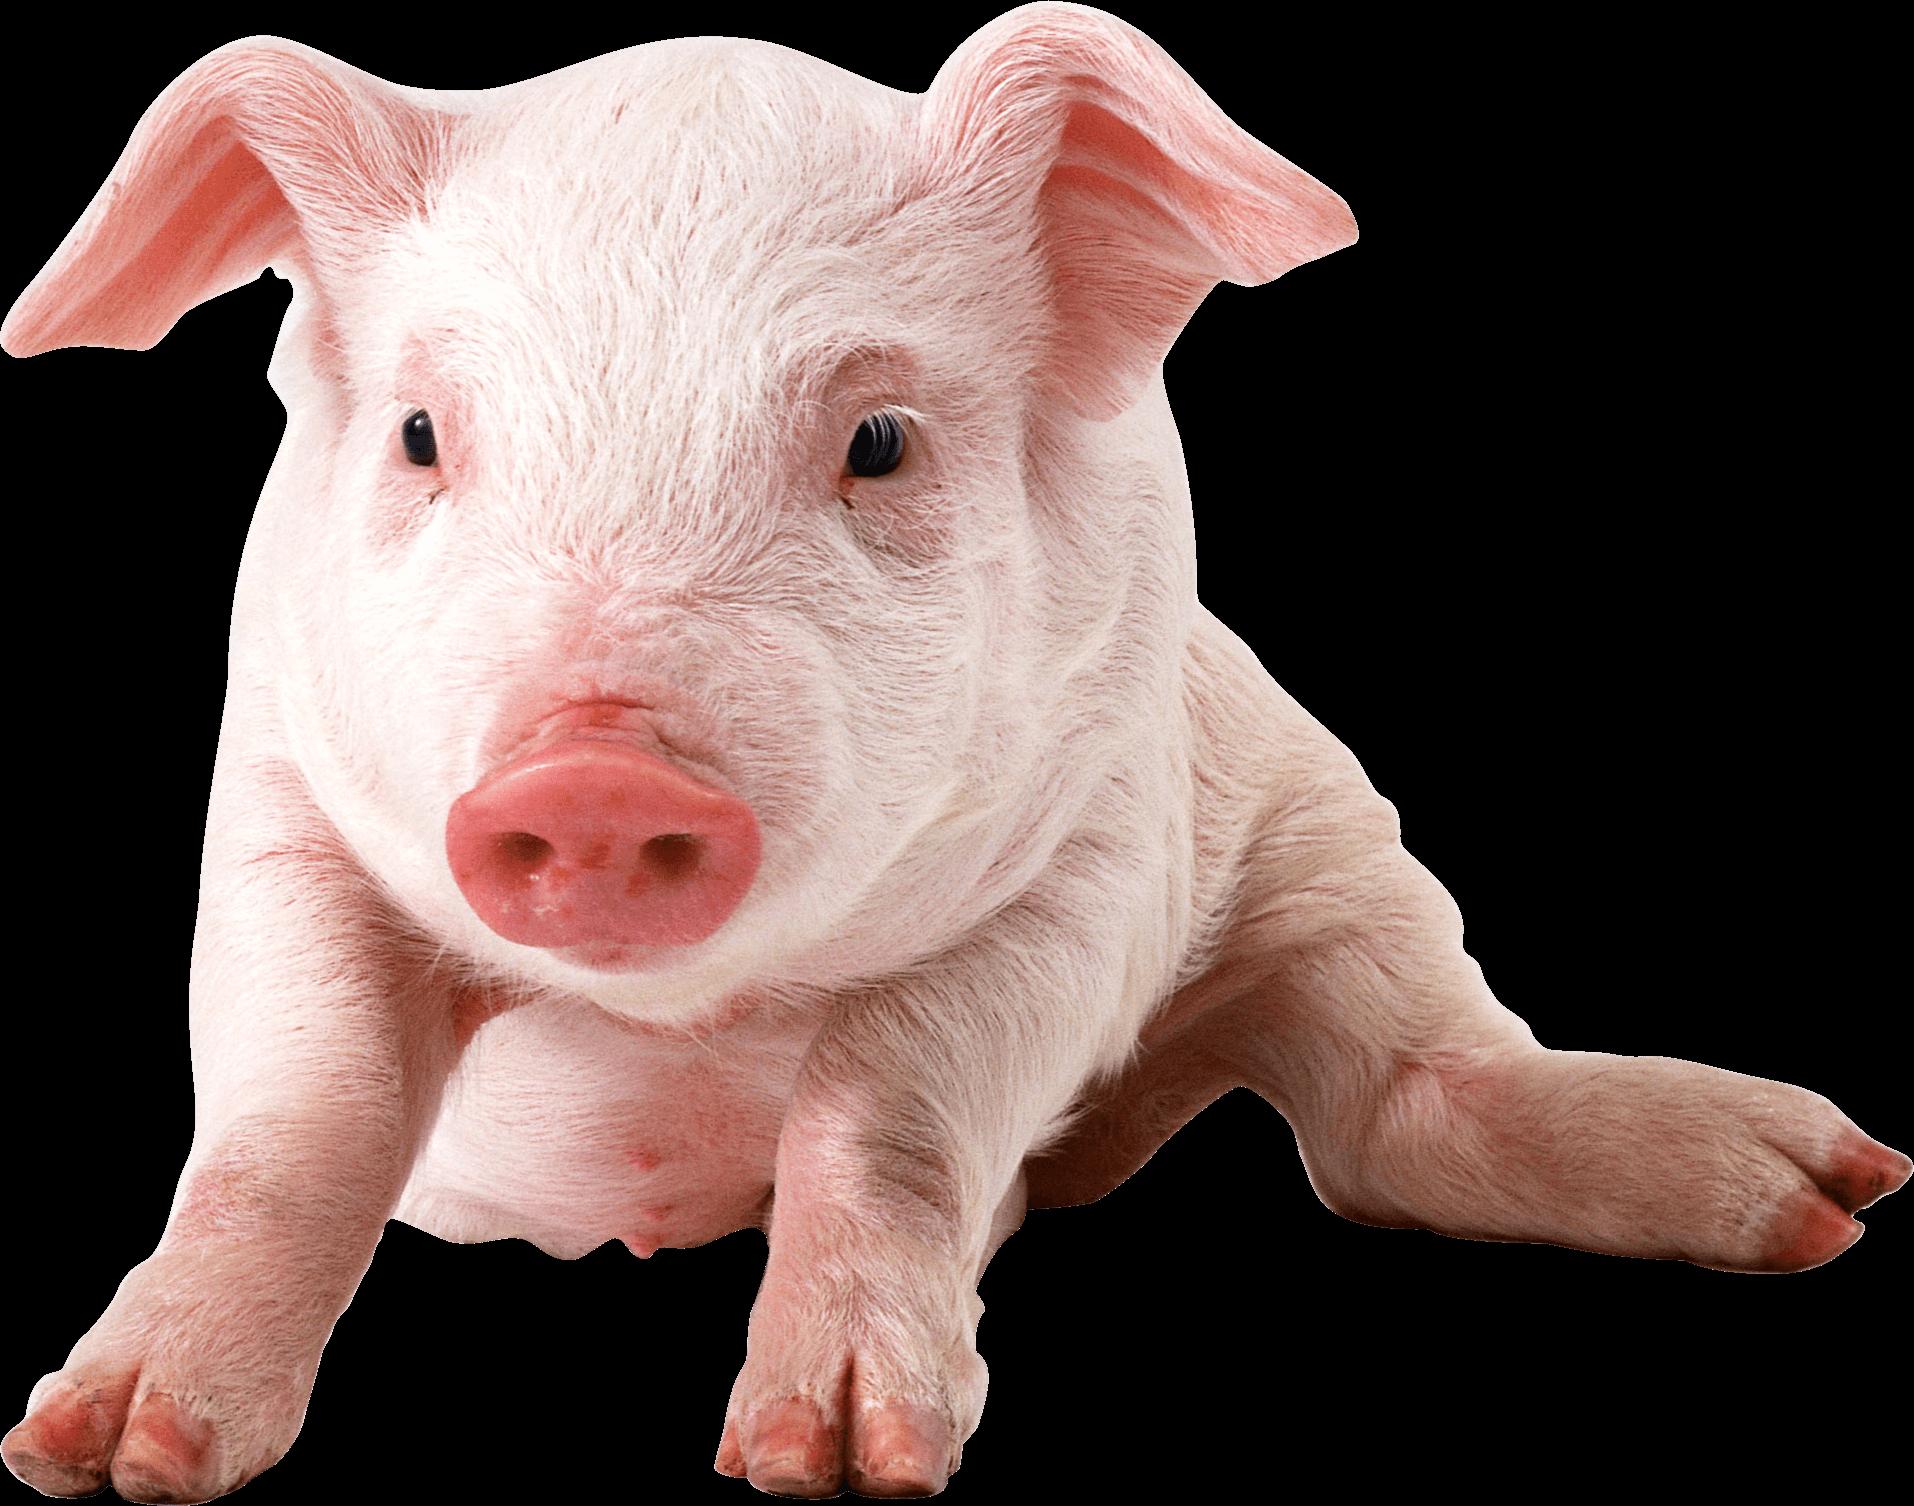 Baby Pig Sitting - Pig PNG